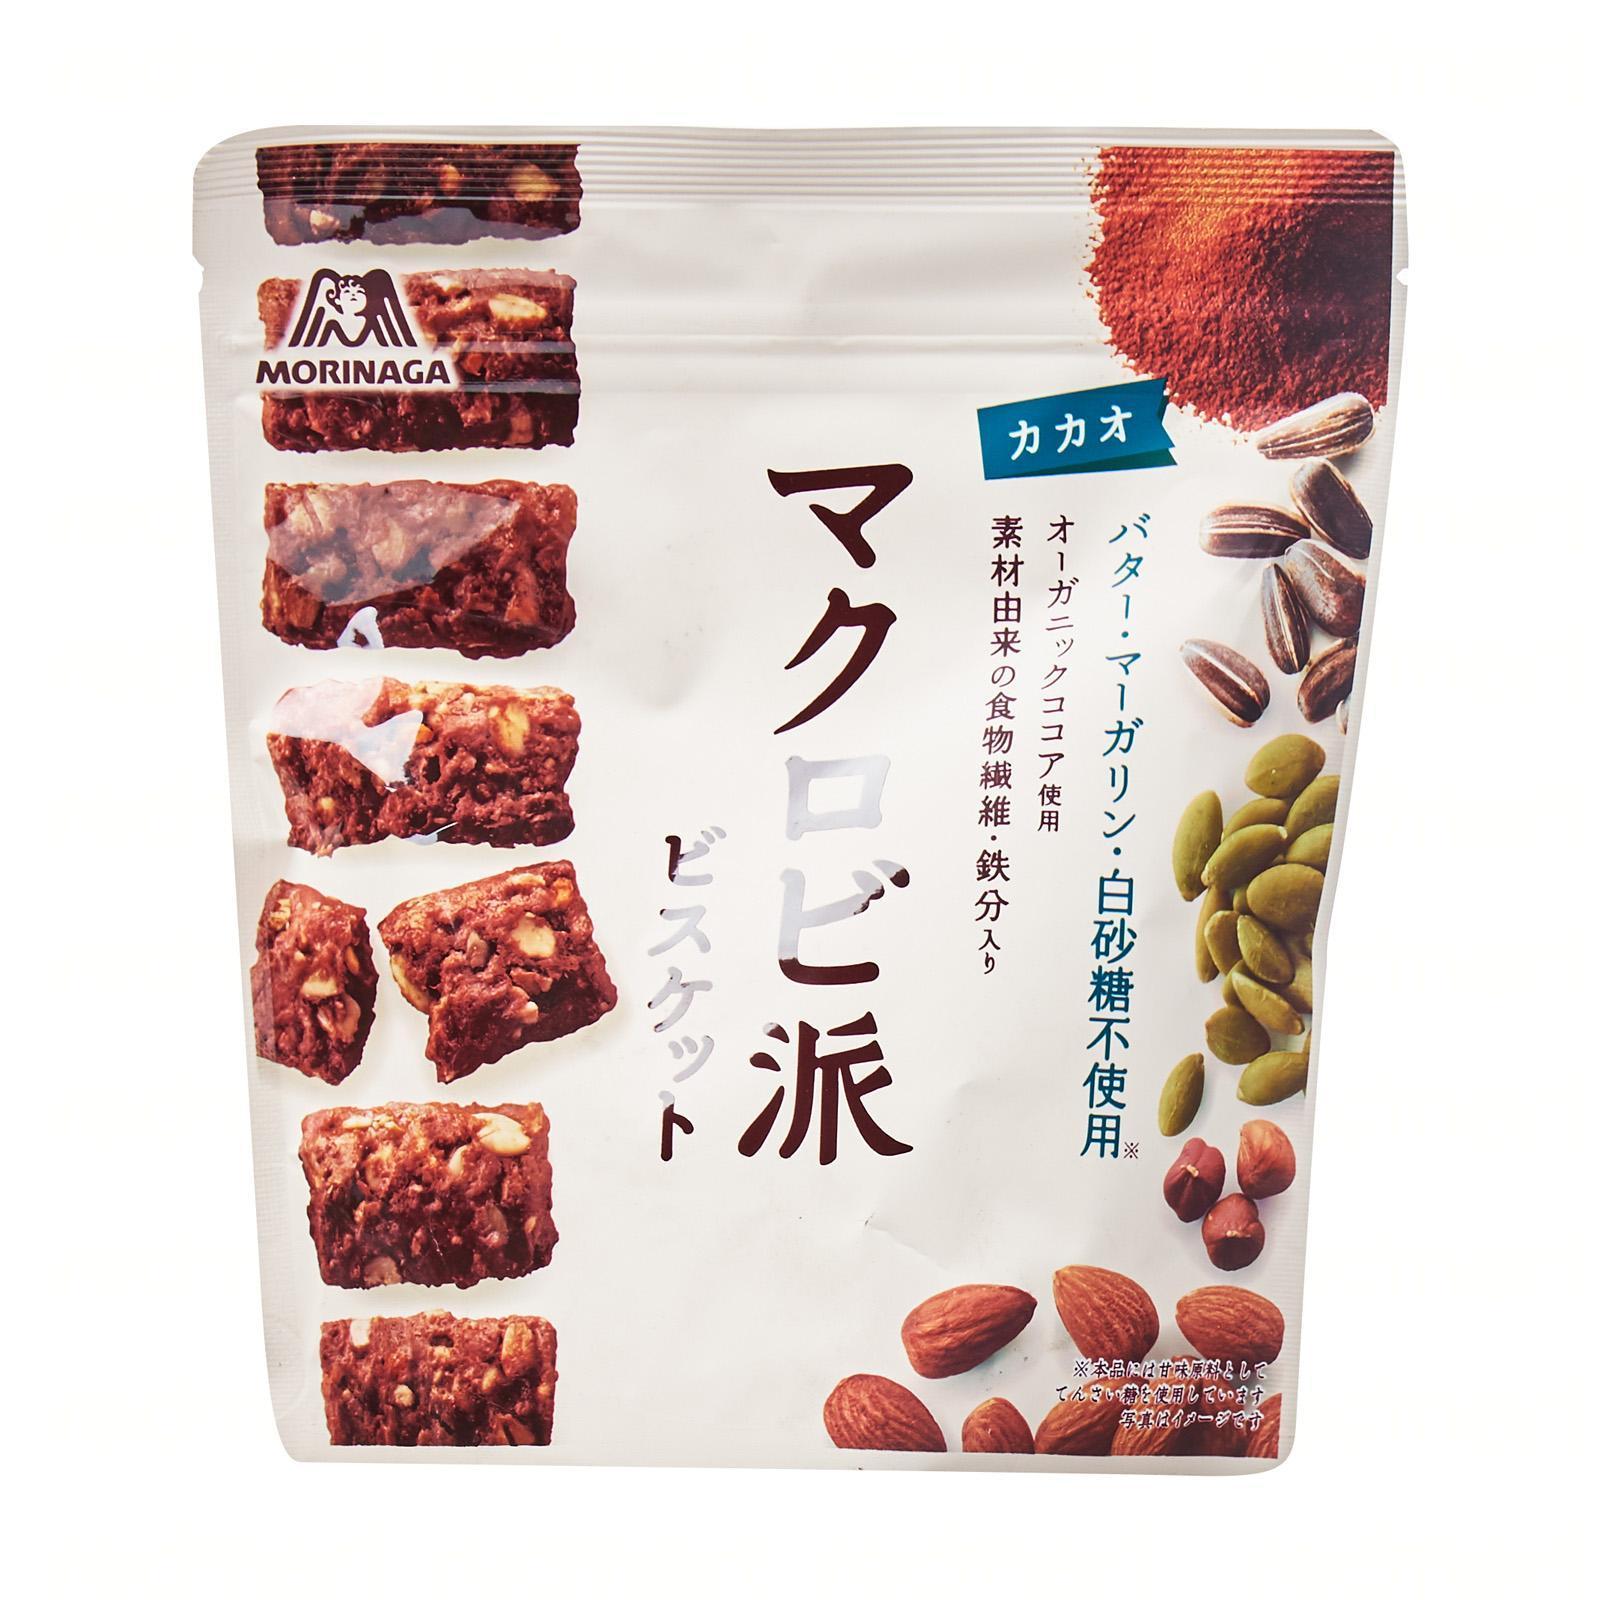 Morinaga Macrobiotic Cocoa Biscuits - Jetro Special